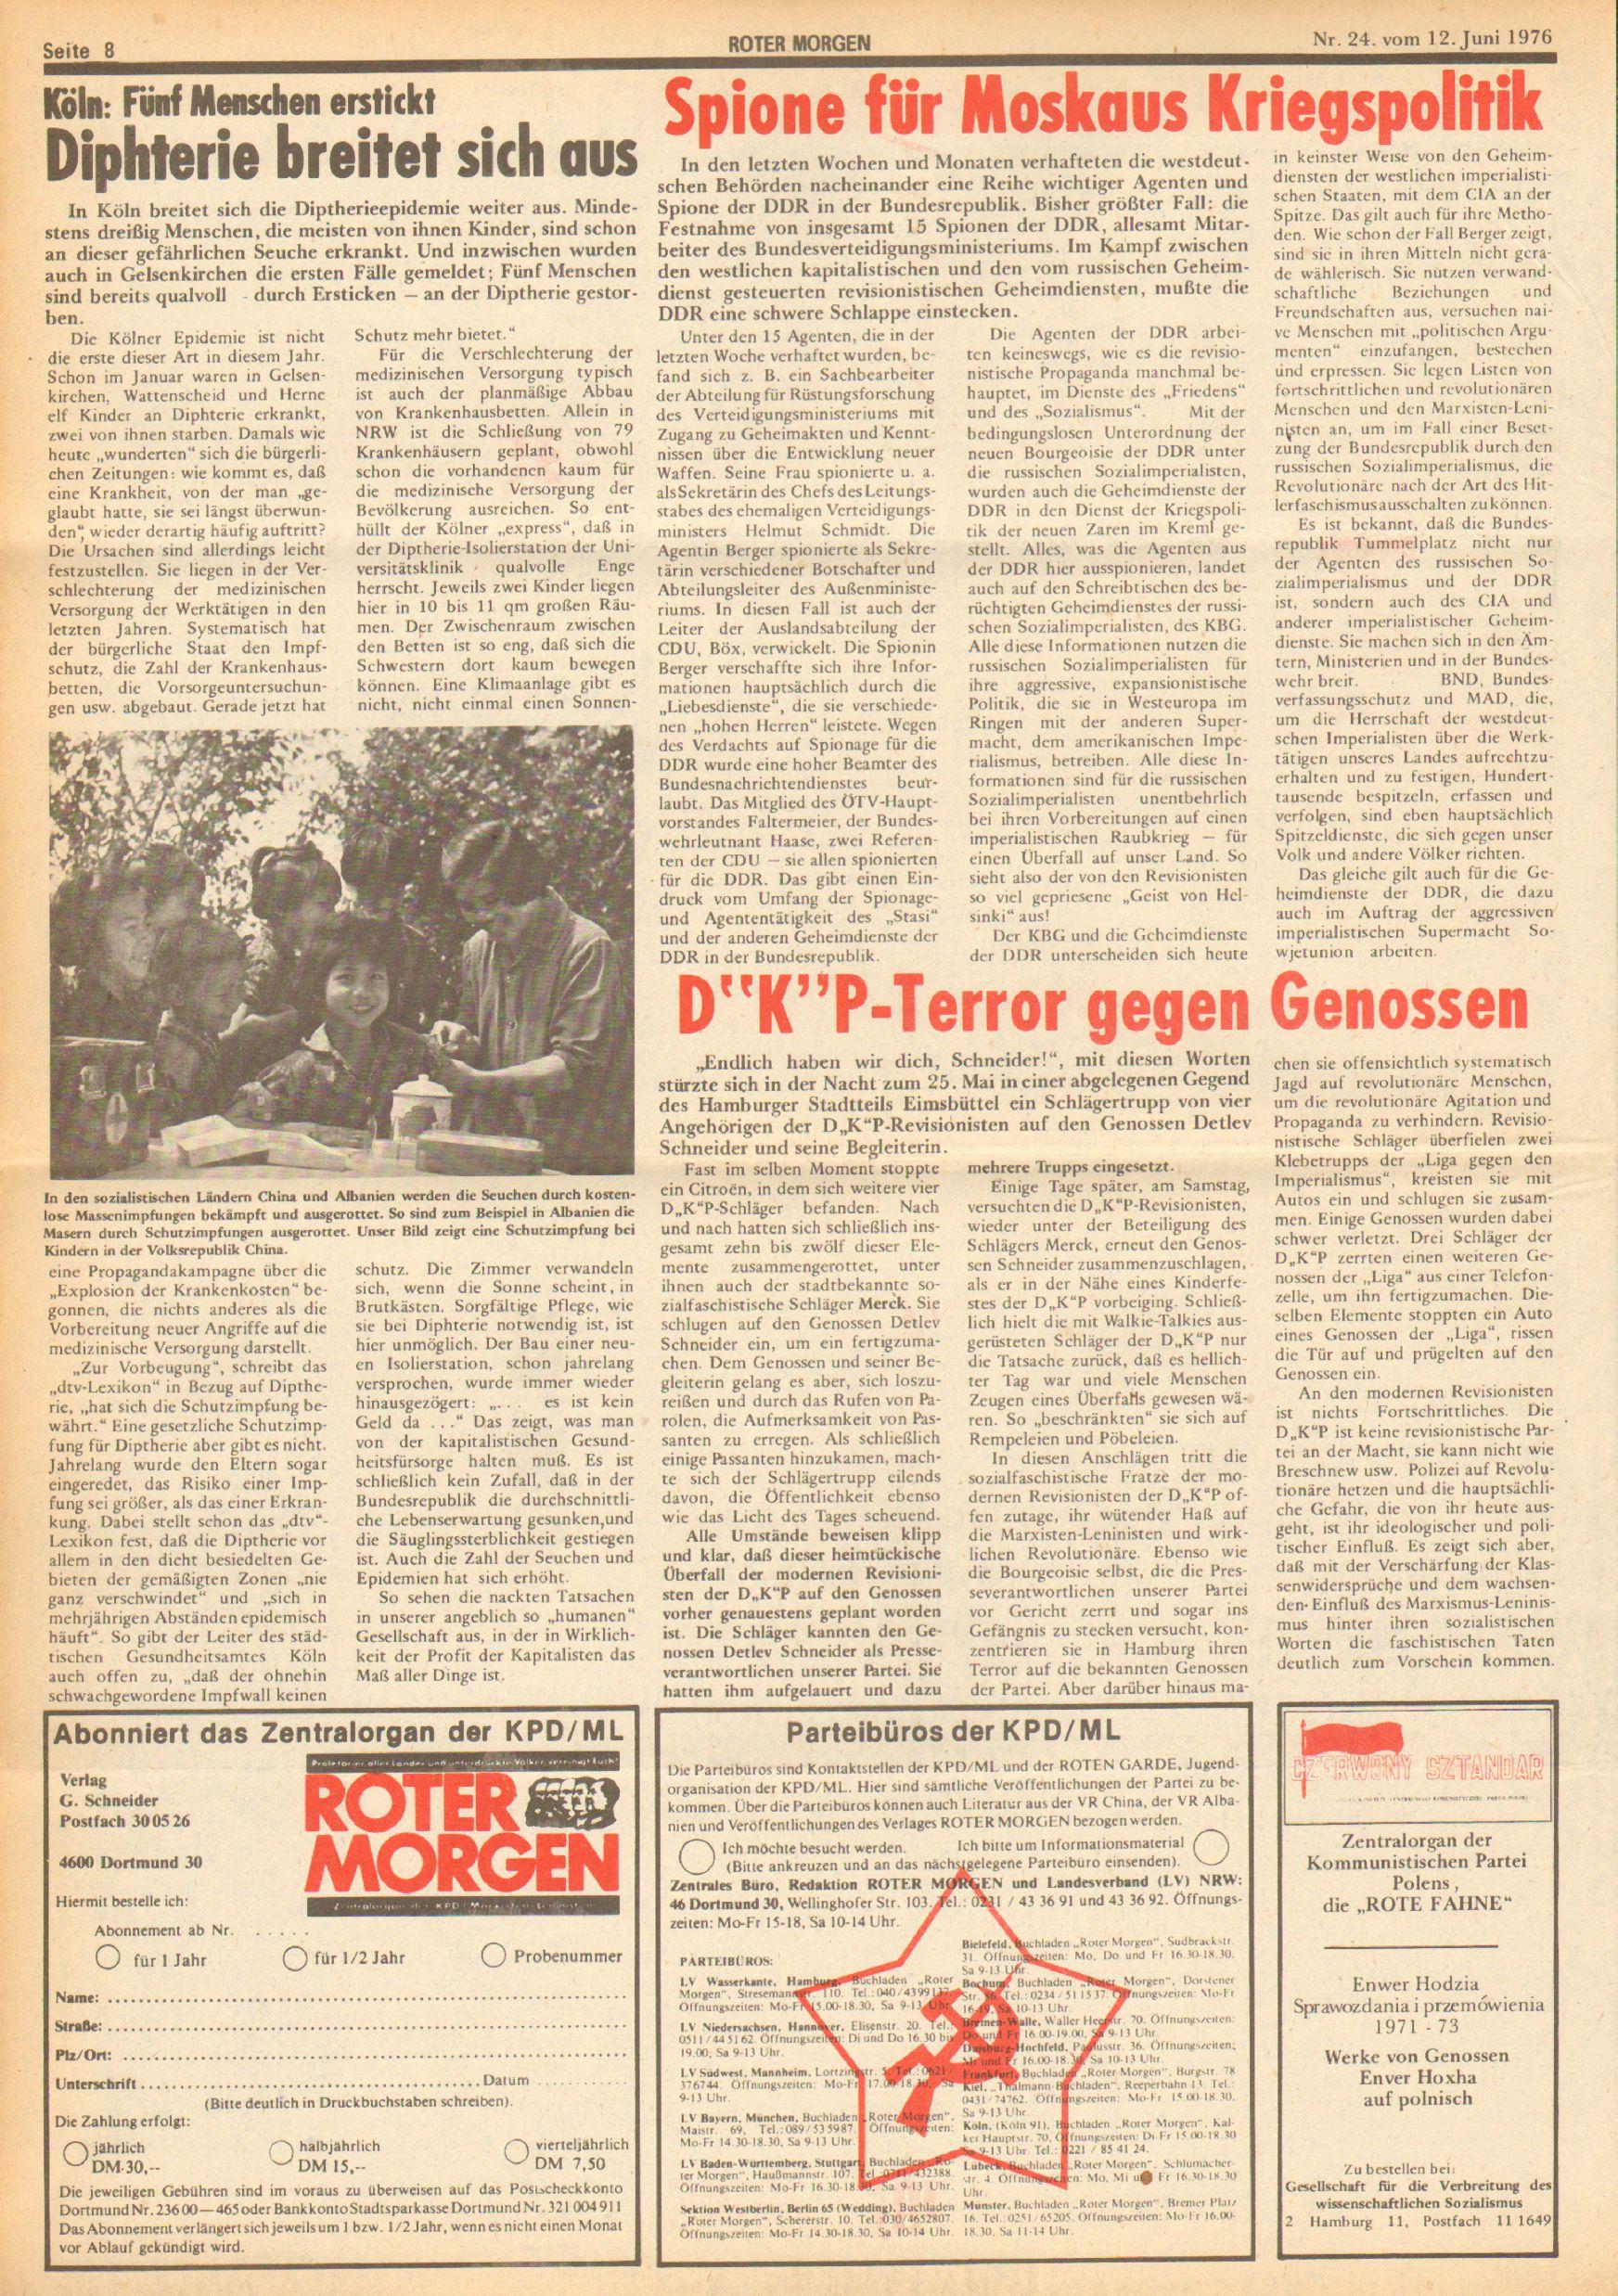 Roter Morgen, 10. Jg., 12. Juni 1976, Nr. 24, Seite 8